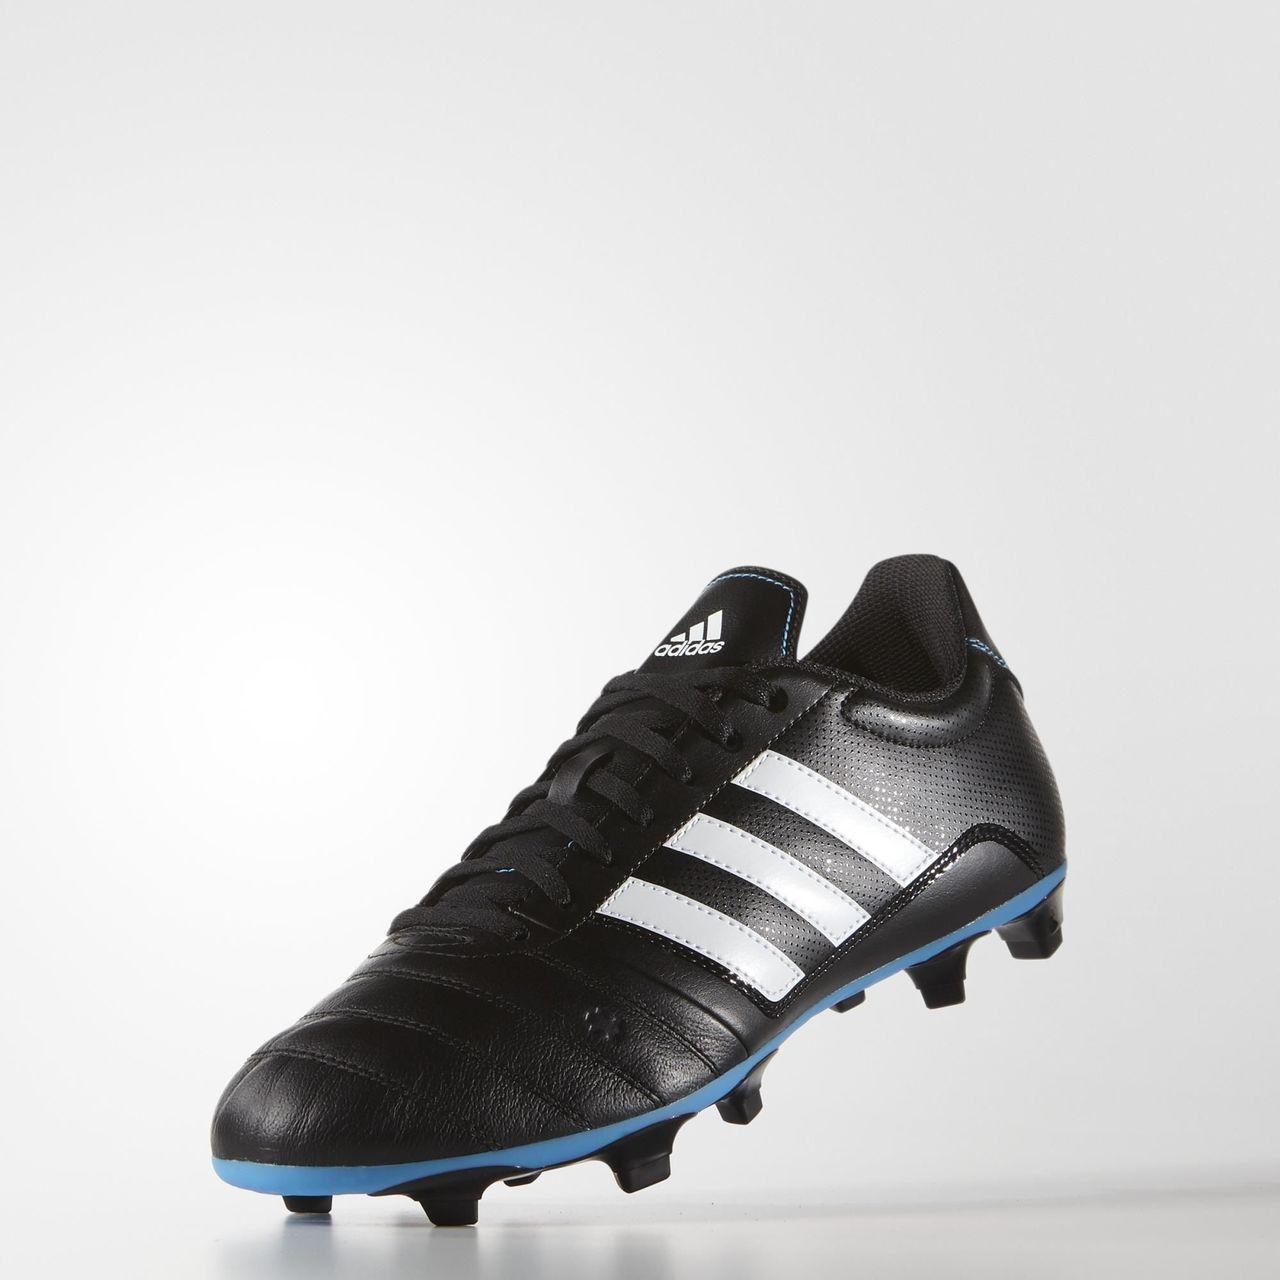 Adidas gloro FG botas de fútbol negro / blanco / Solar Azul